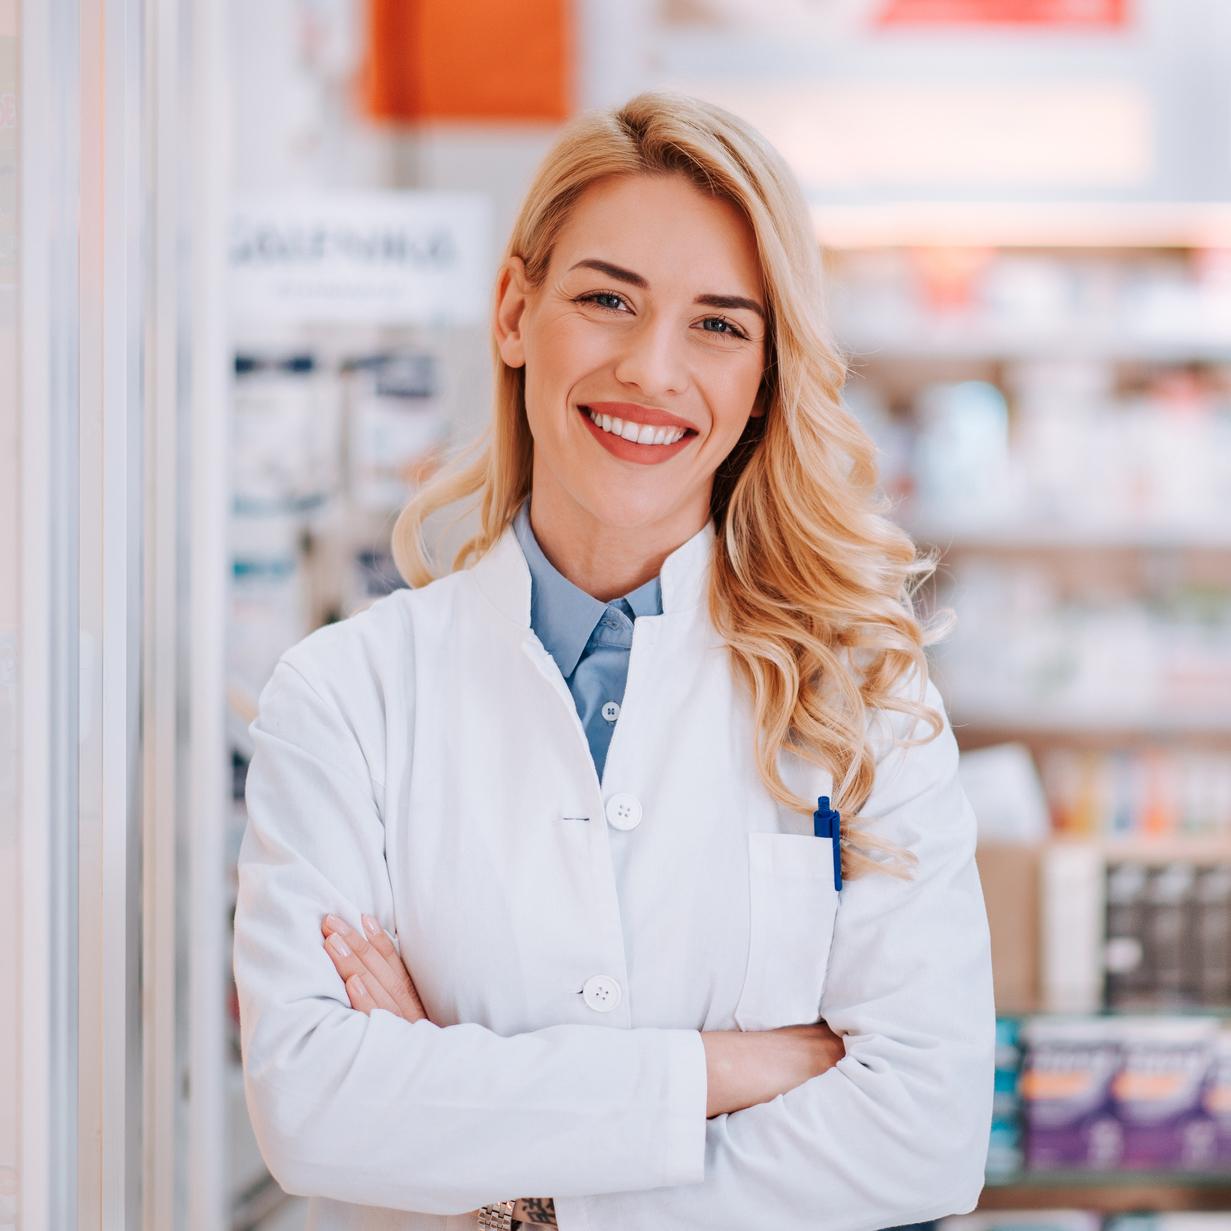 Stephanie Pharmacy Graduate Washington, D.C. Dream Financial Planning